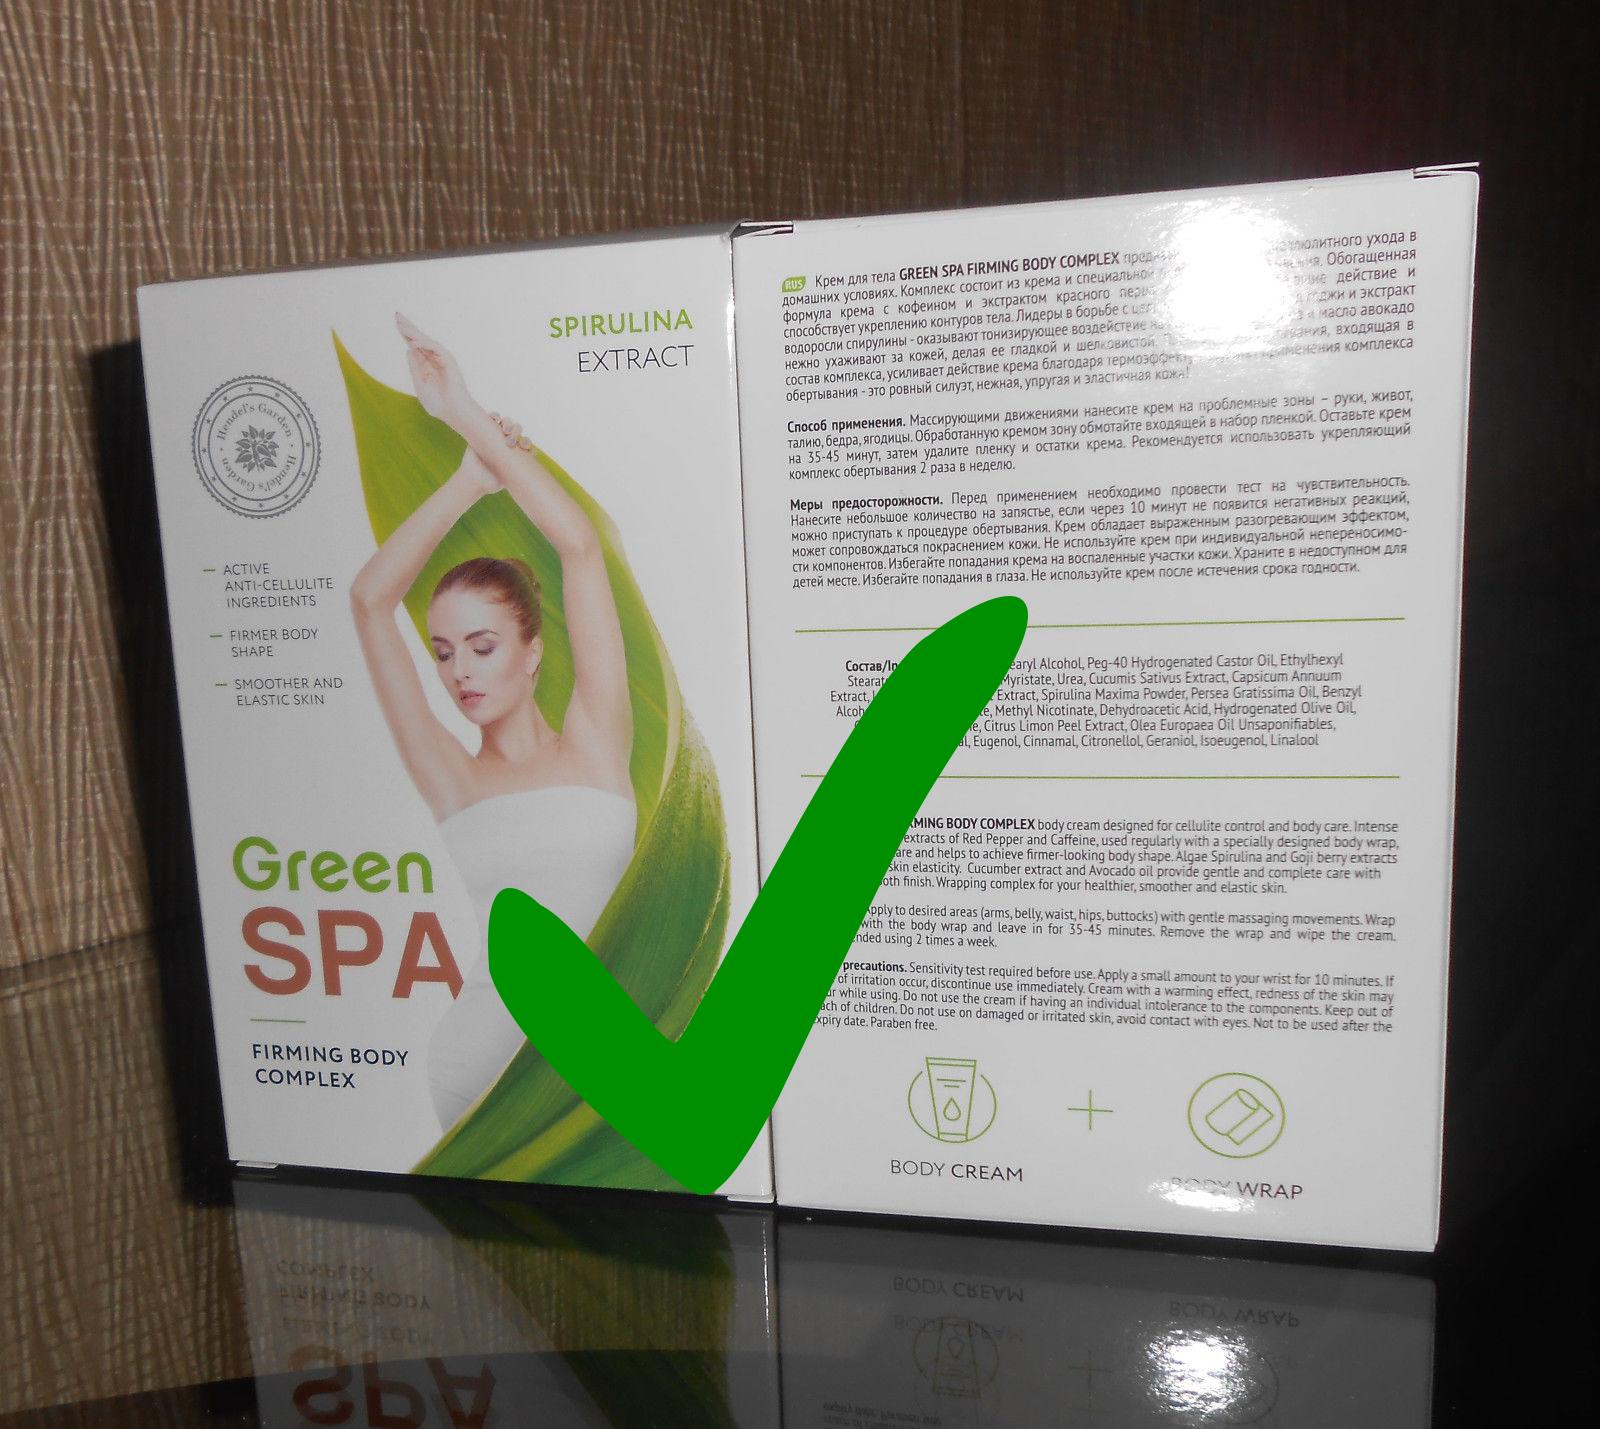 Green Spa (Producto Original)